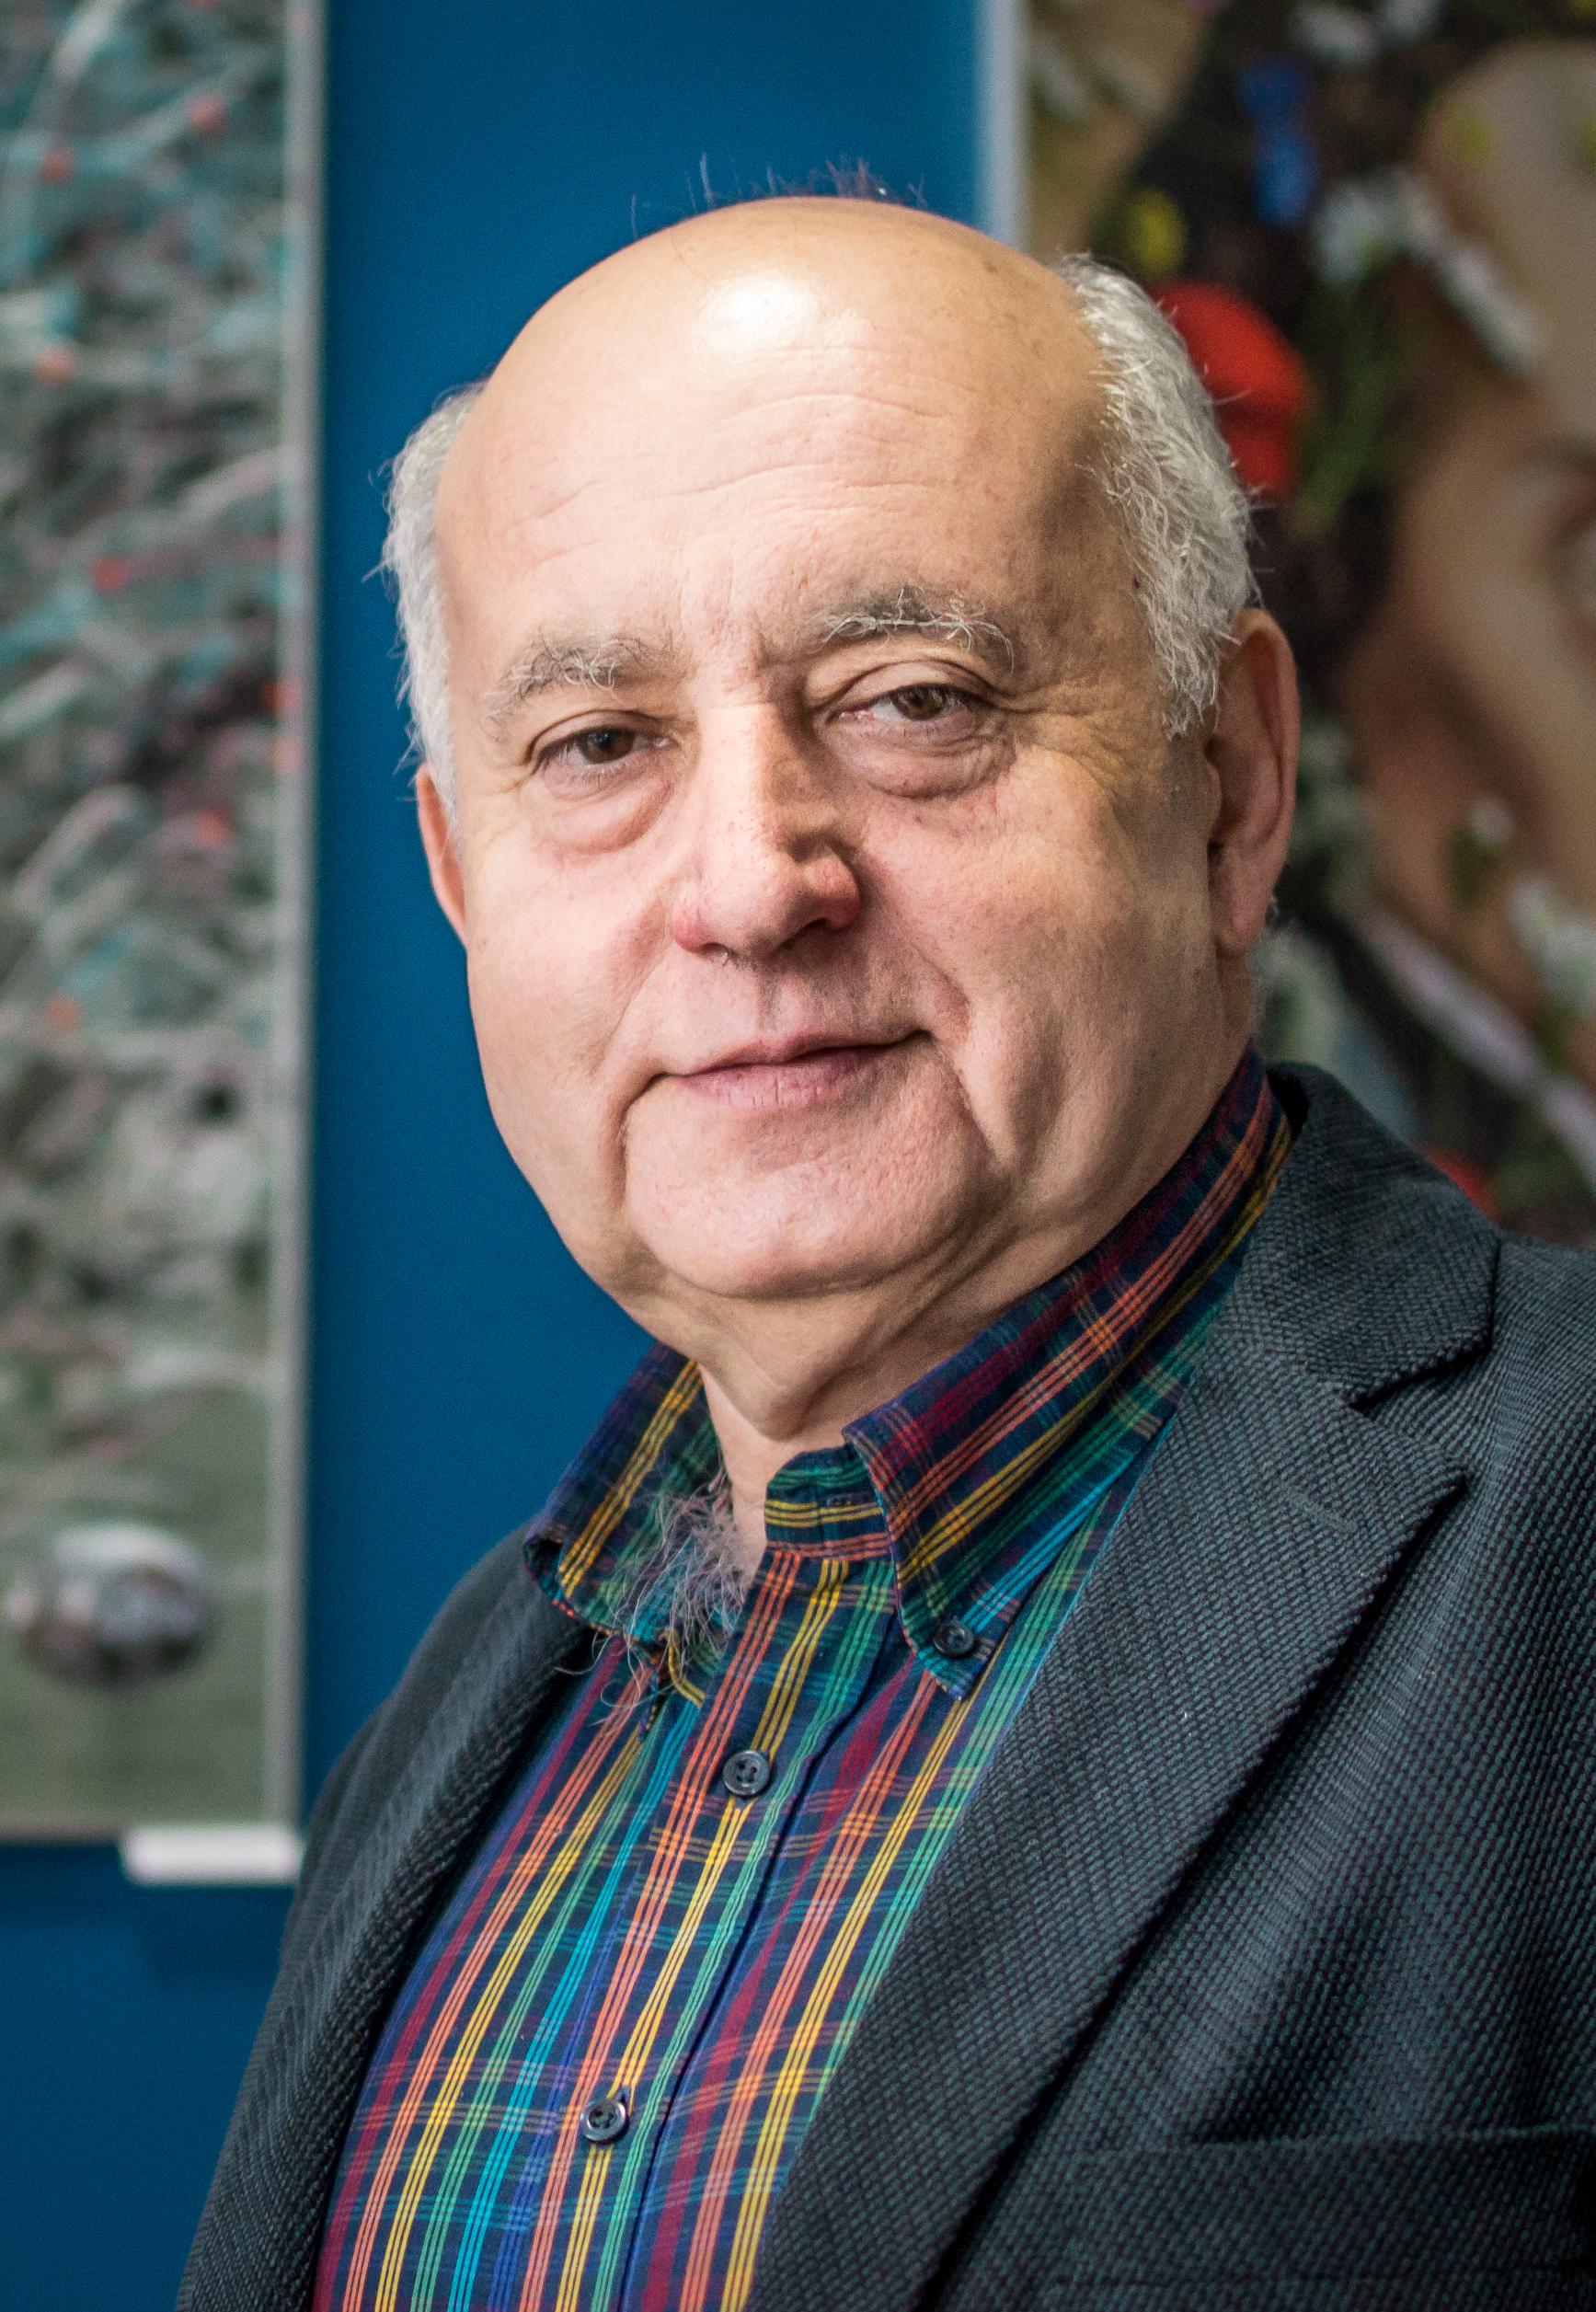 prof. Marek Bulsa